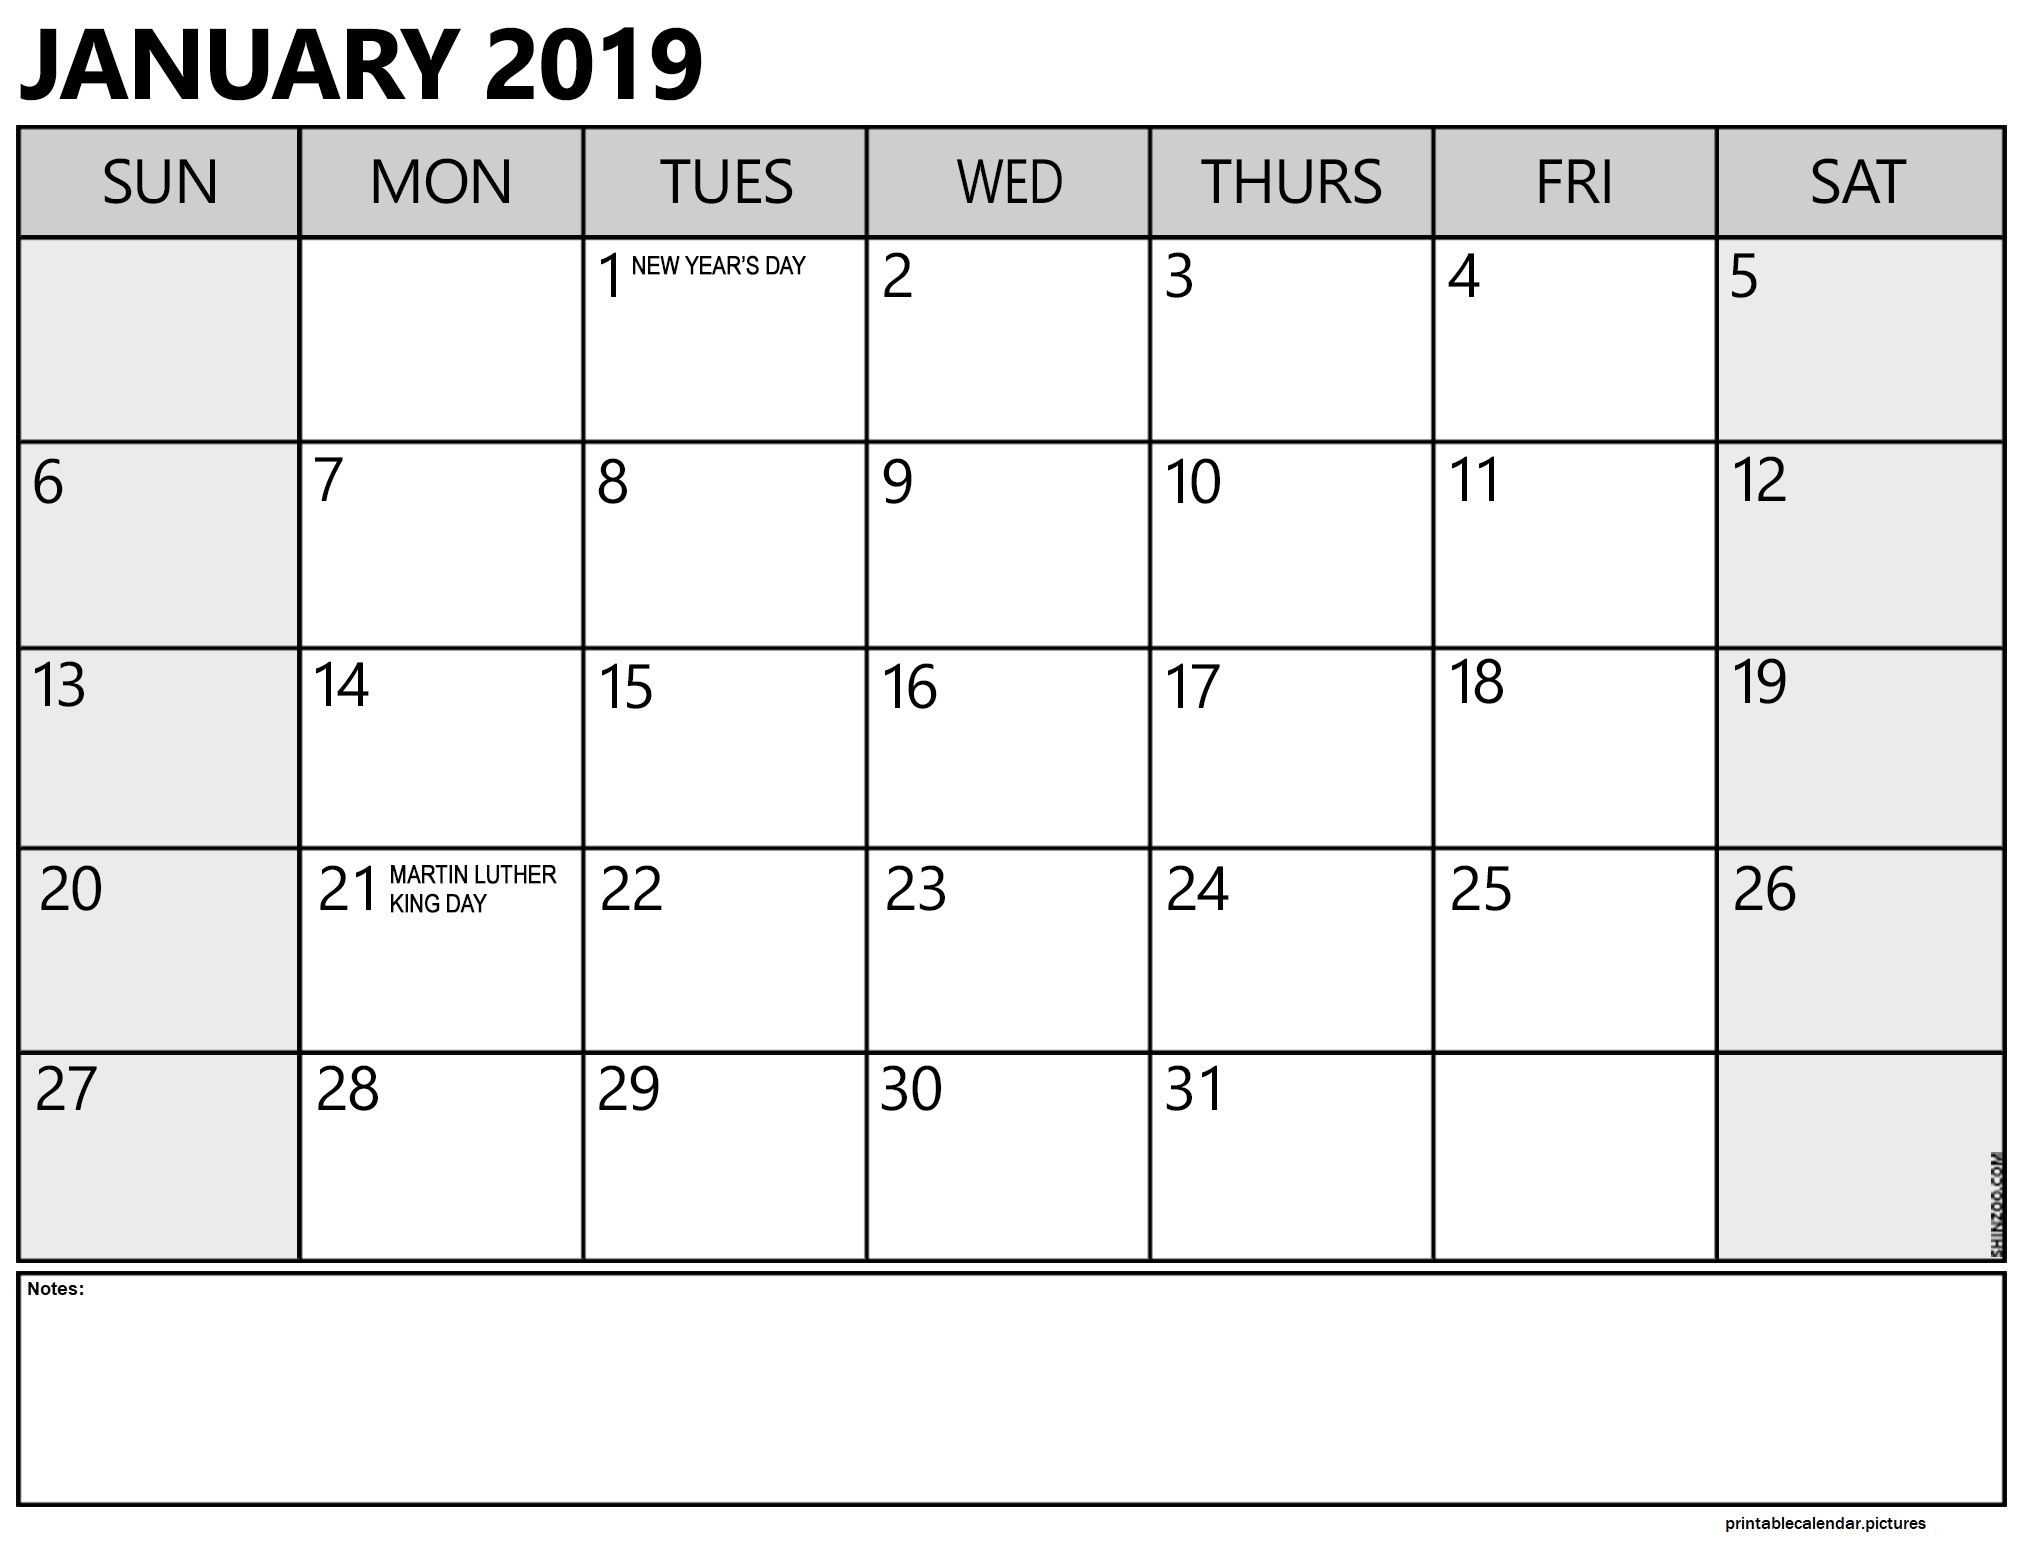 January 2019 Calendar With Holidays | Free Monthly Calendar